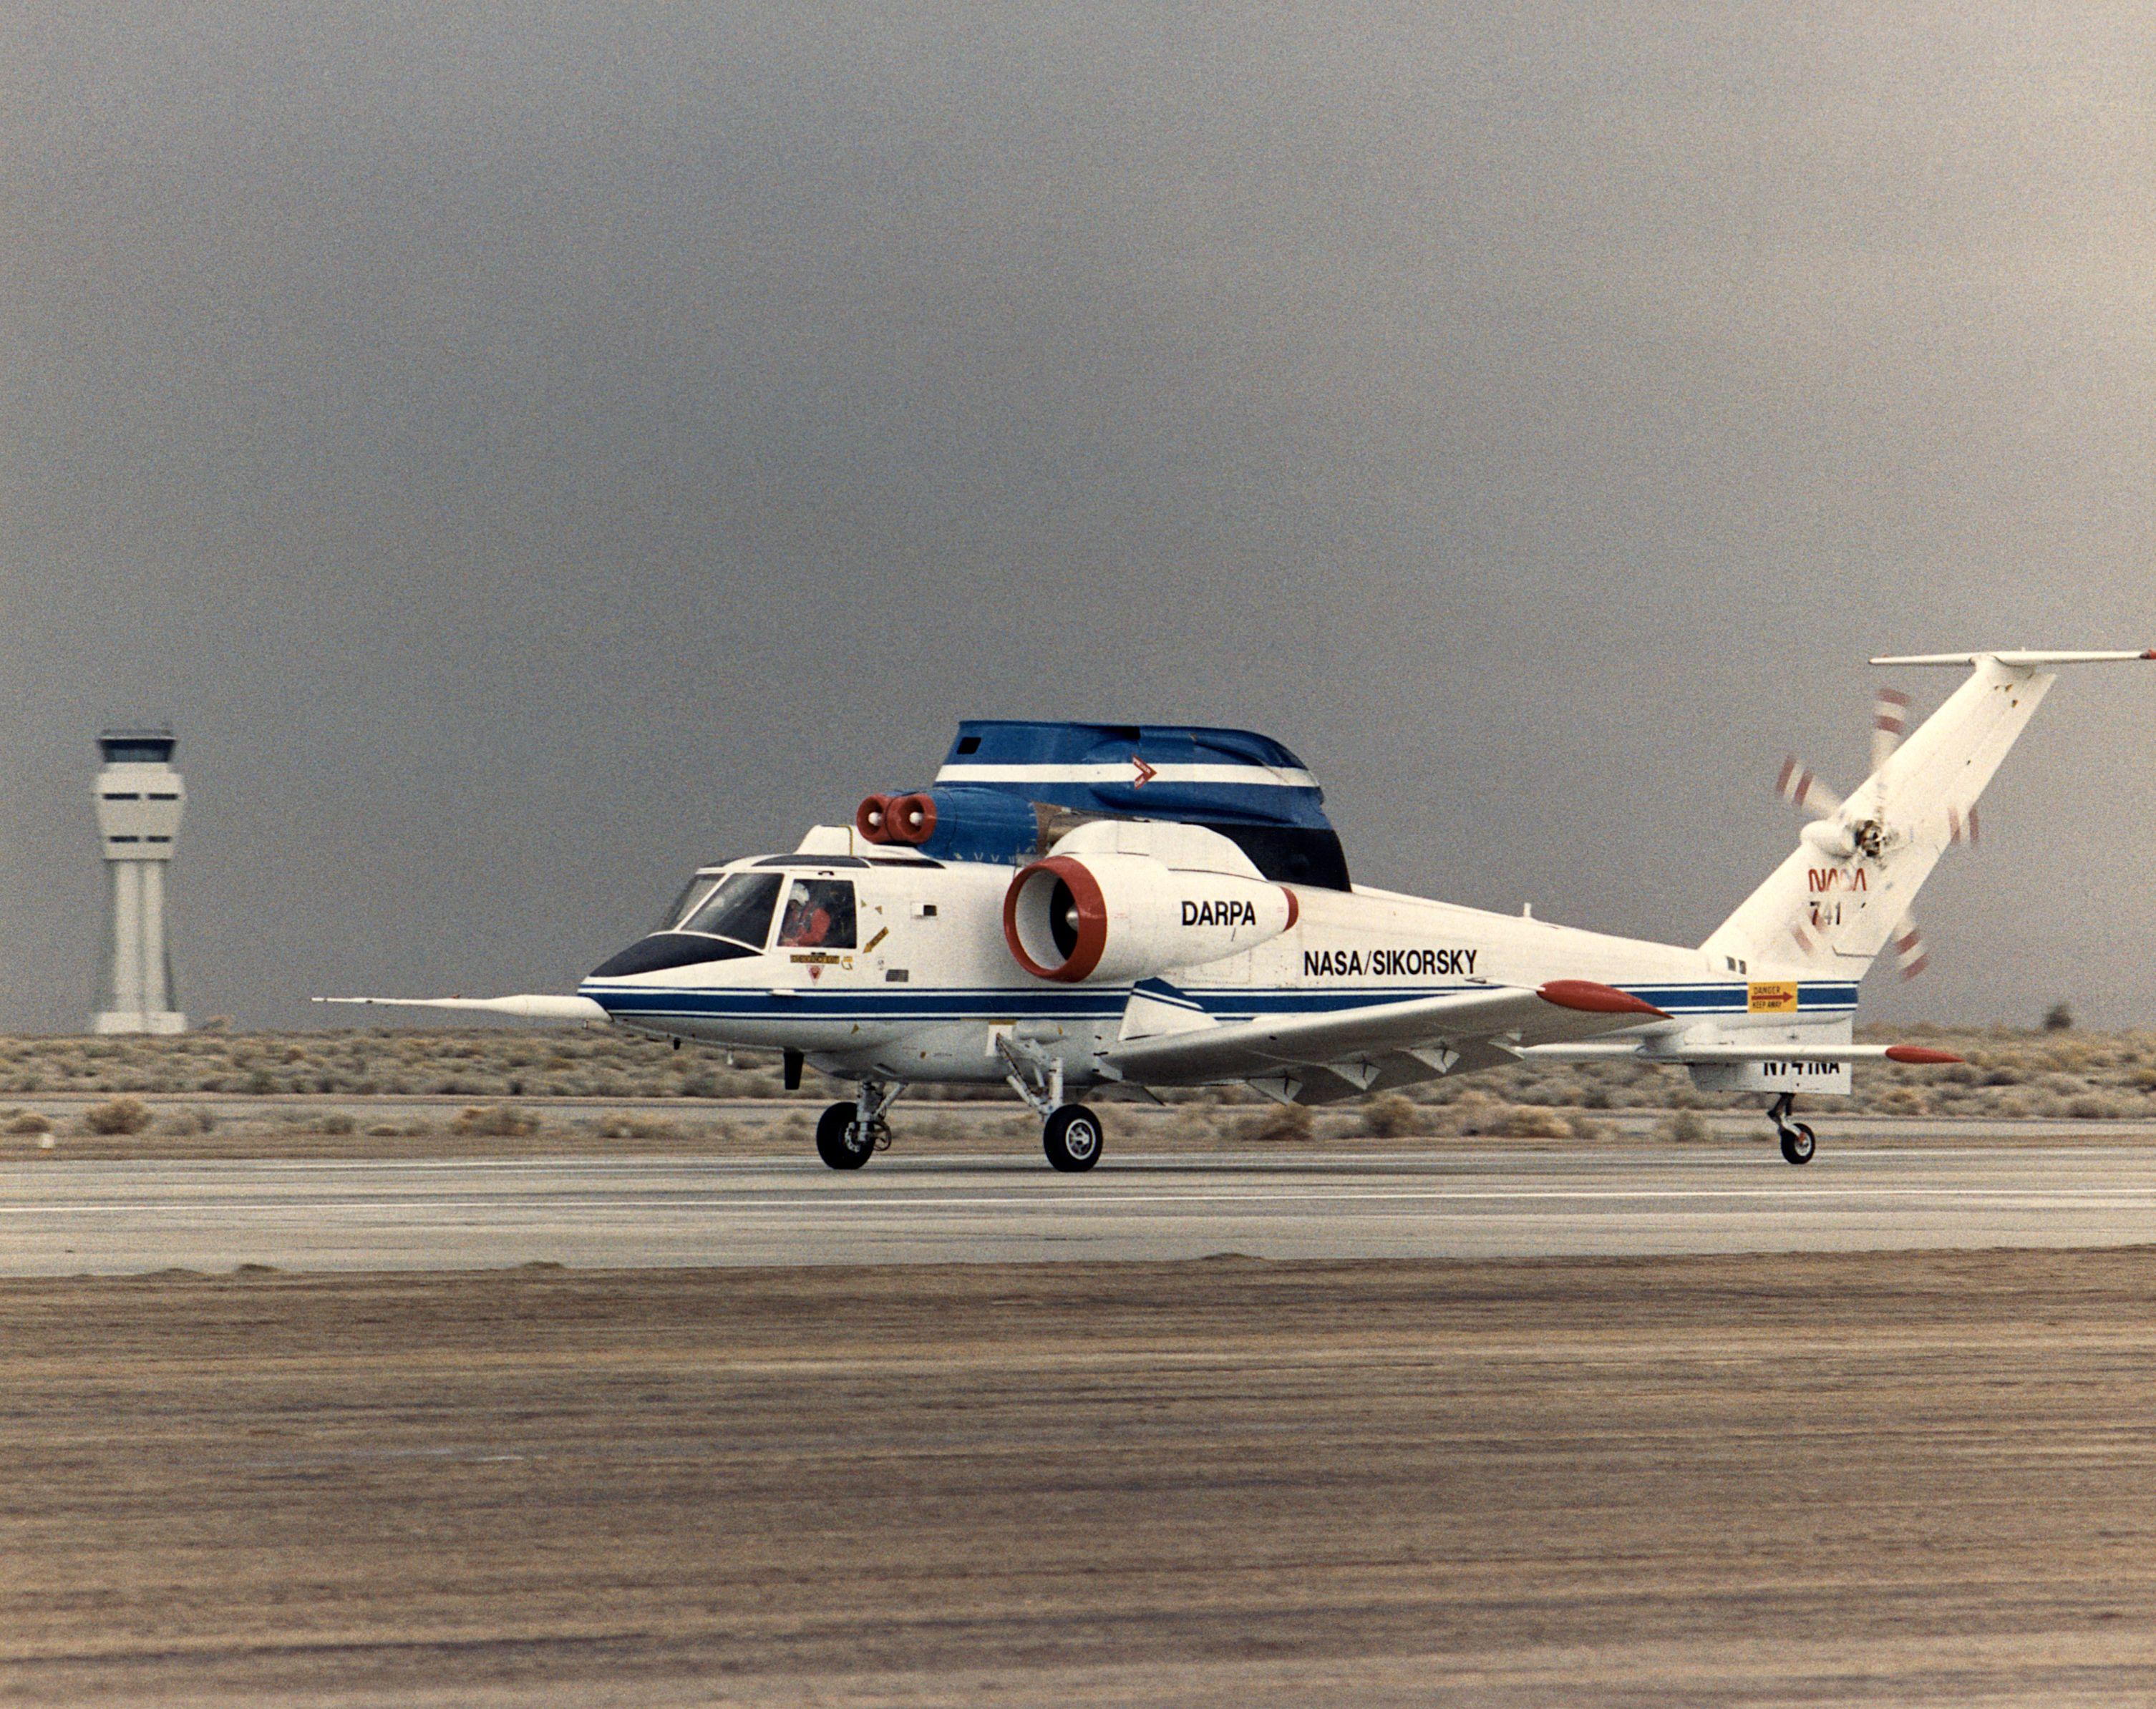 File:X-wing EC87-0271-001 NASA.jpg - Wikimedia Commons